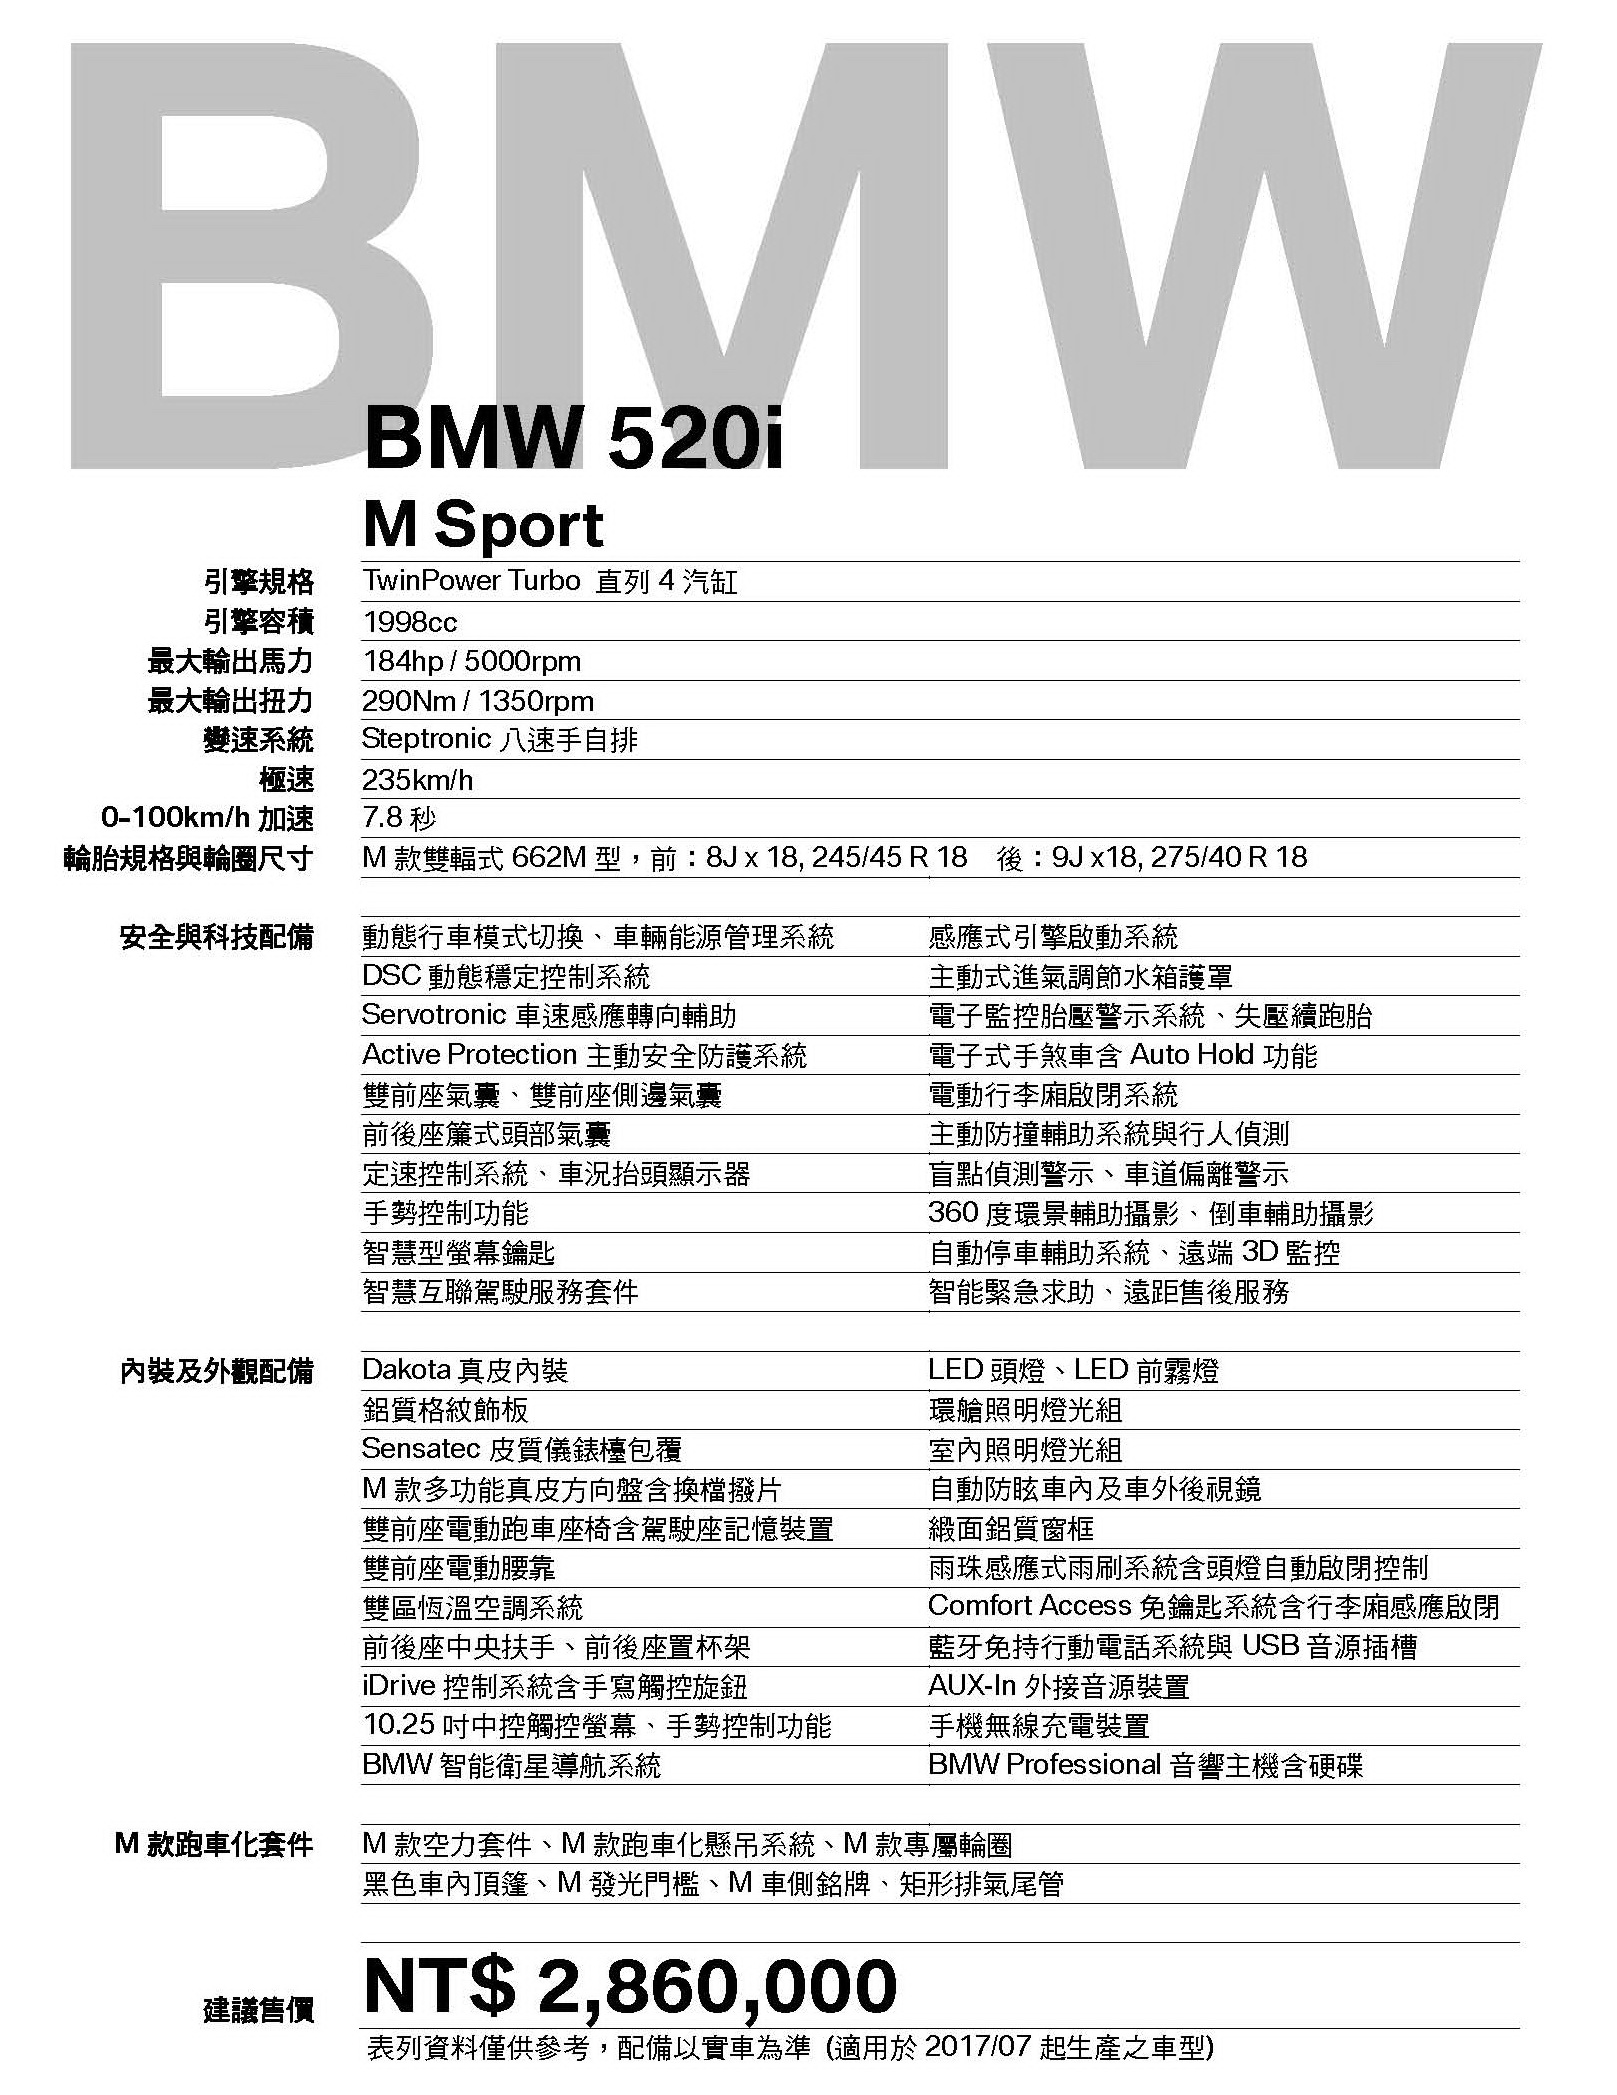 車展表520i M Sport(2017-07)_286